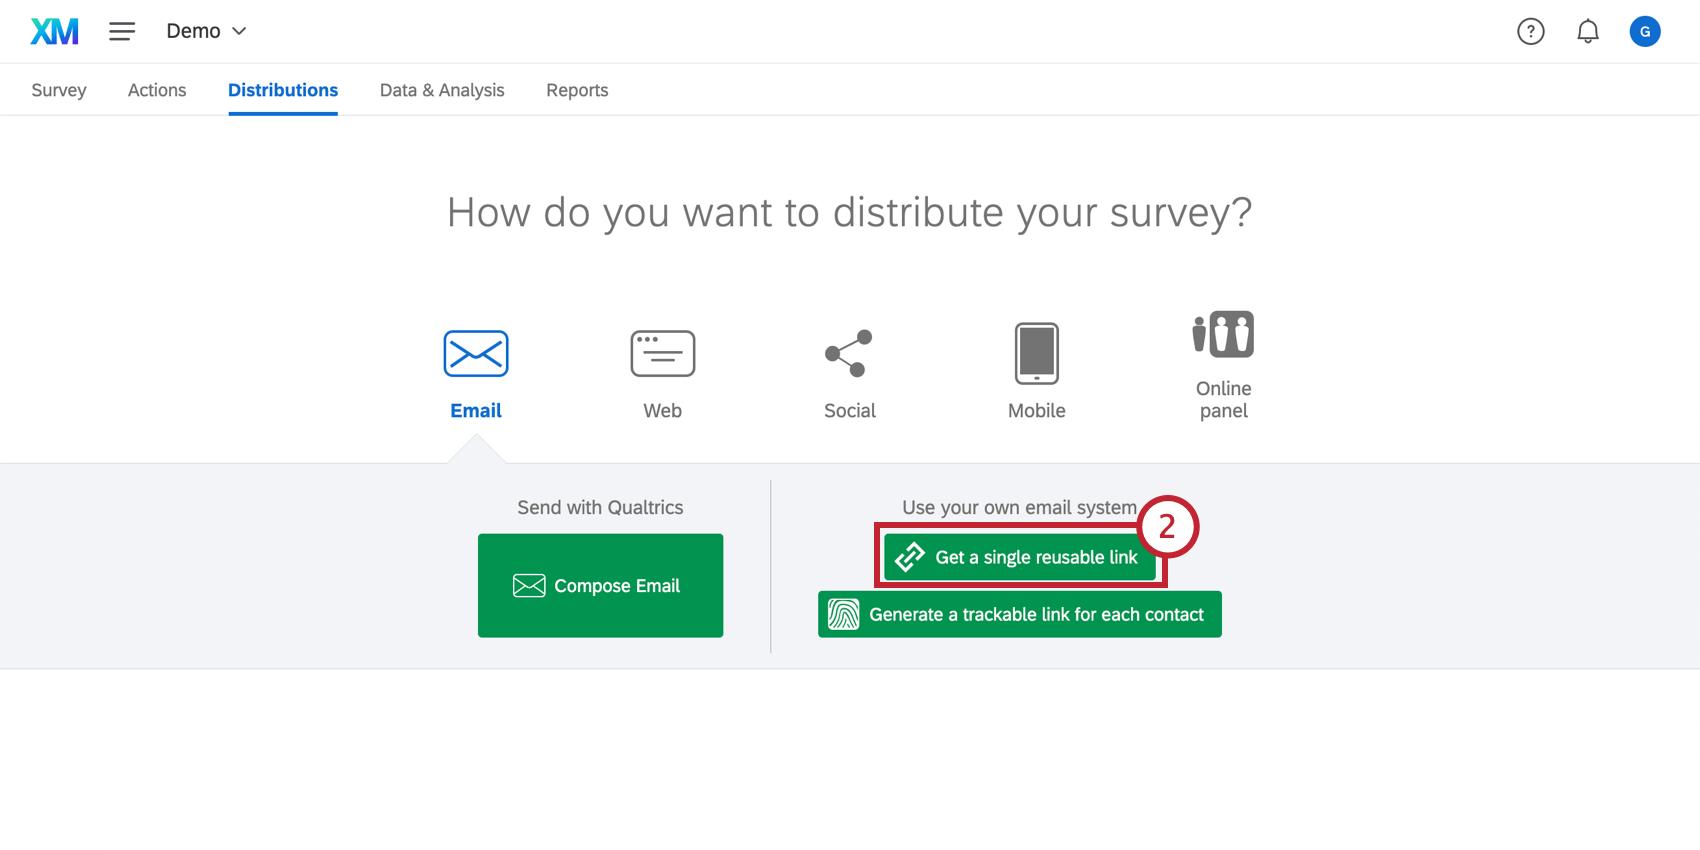 Clicking the green Get a single reusable link button